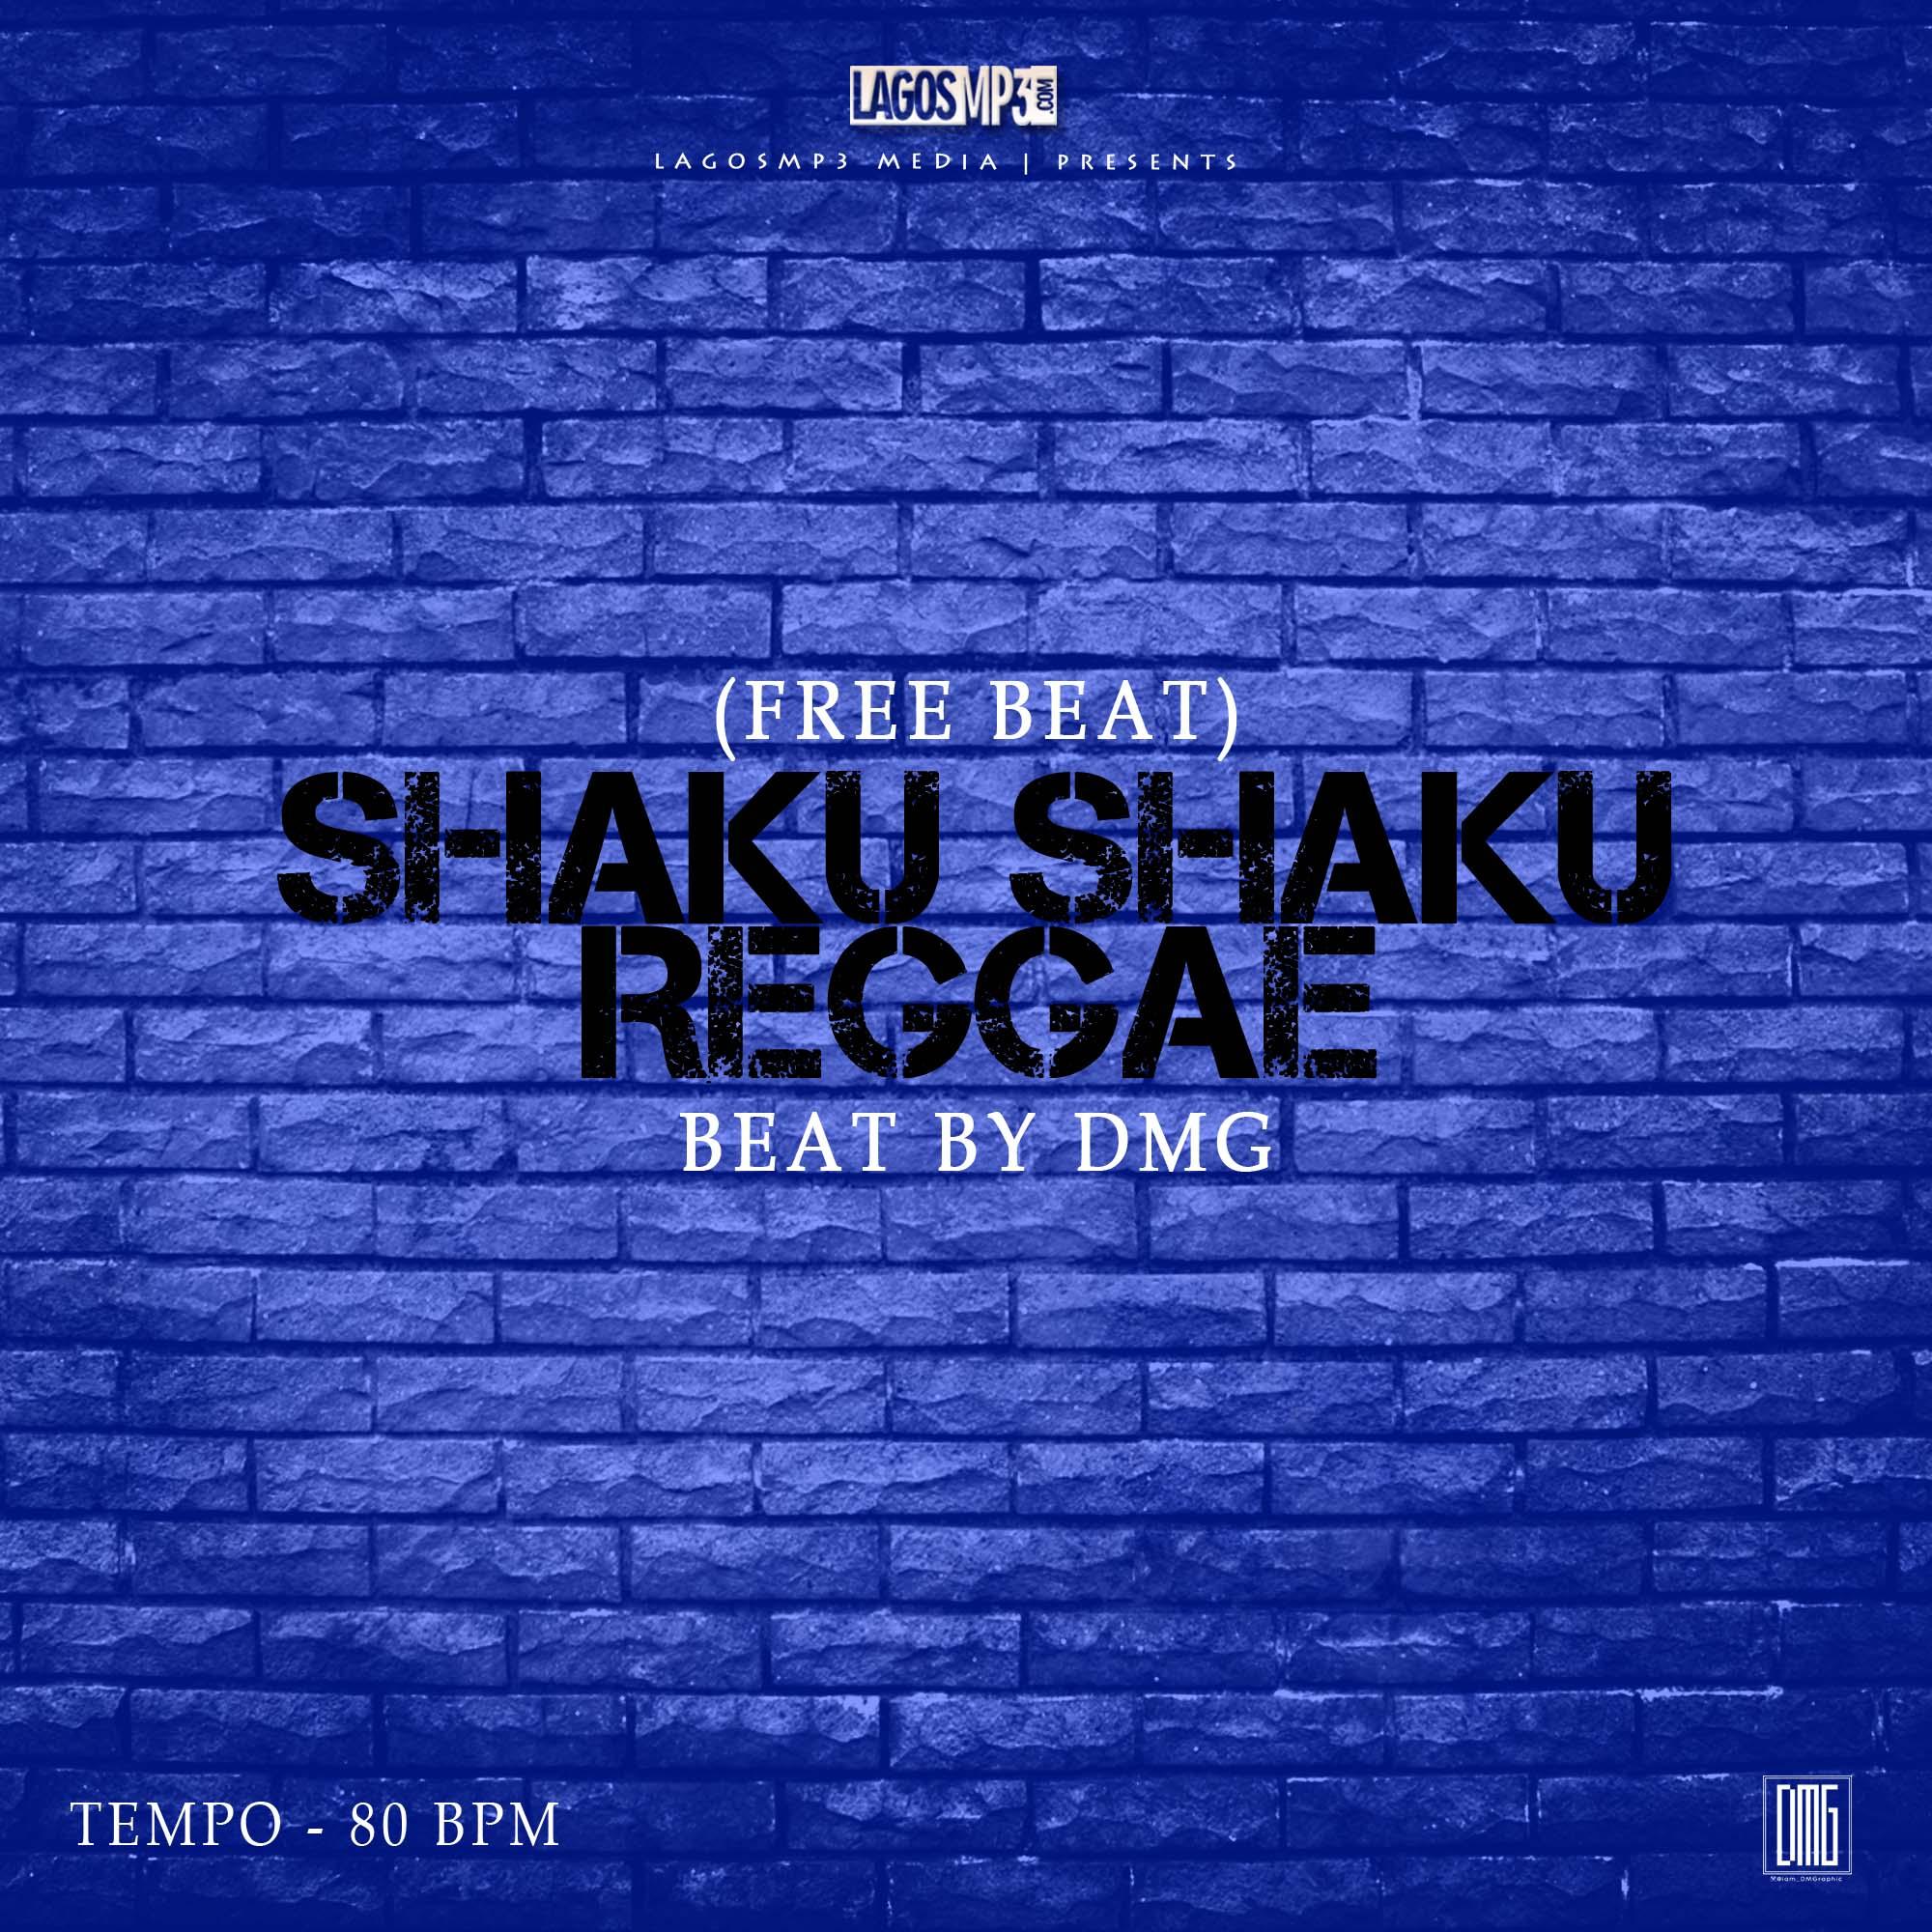 Freebeat Shaku Shaku Reggae (Prod. by DMG)